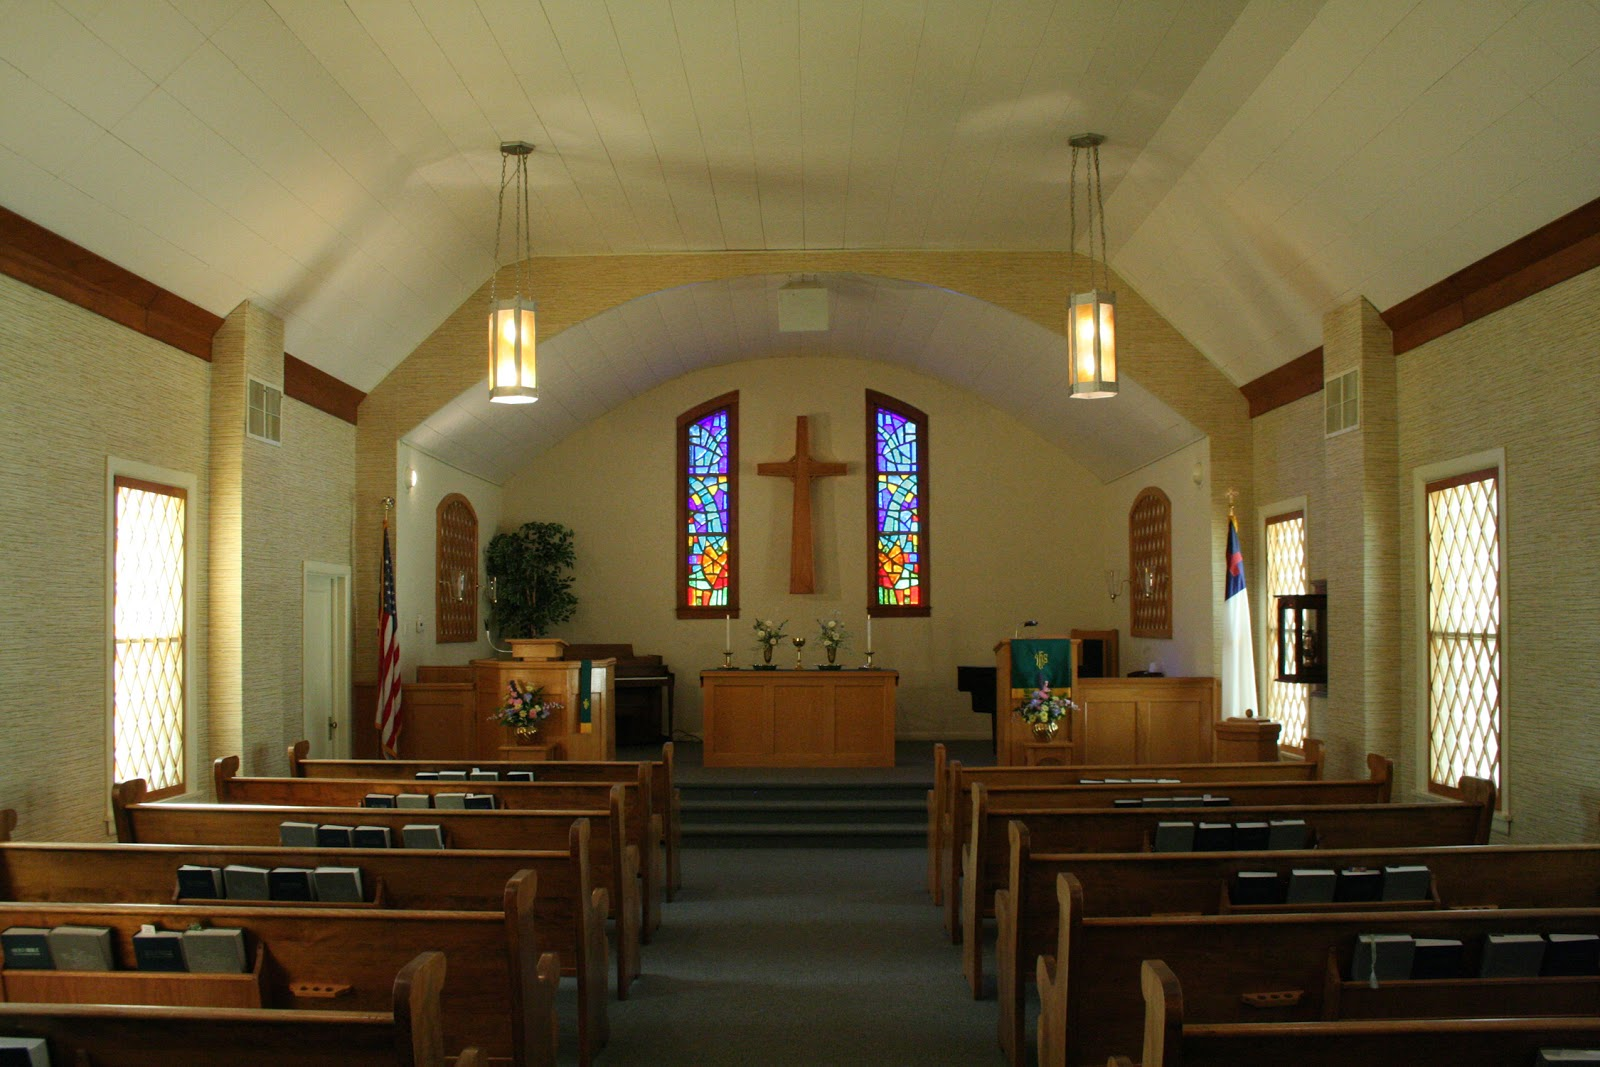 Emejing Small Church Sanctuary Design Ideas Photos - Interior Design ...